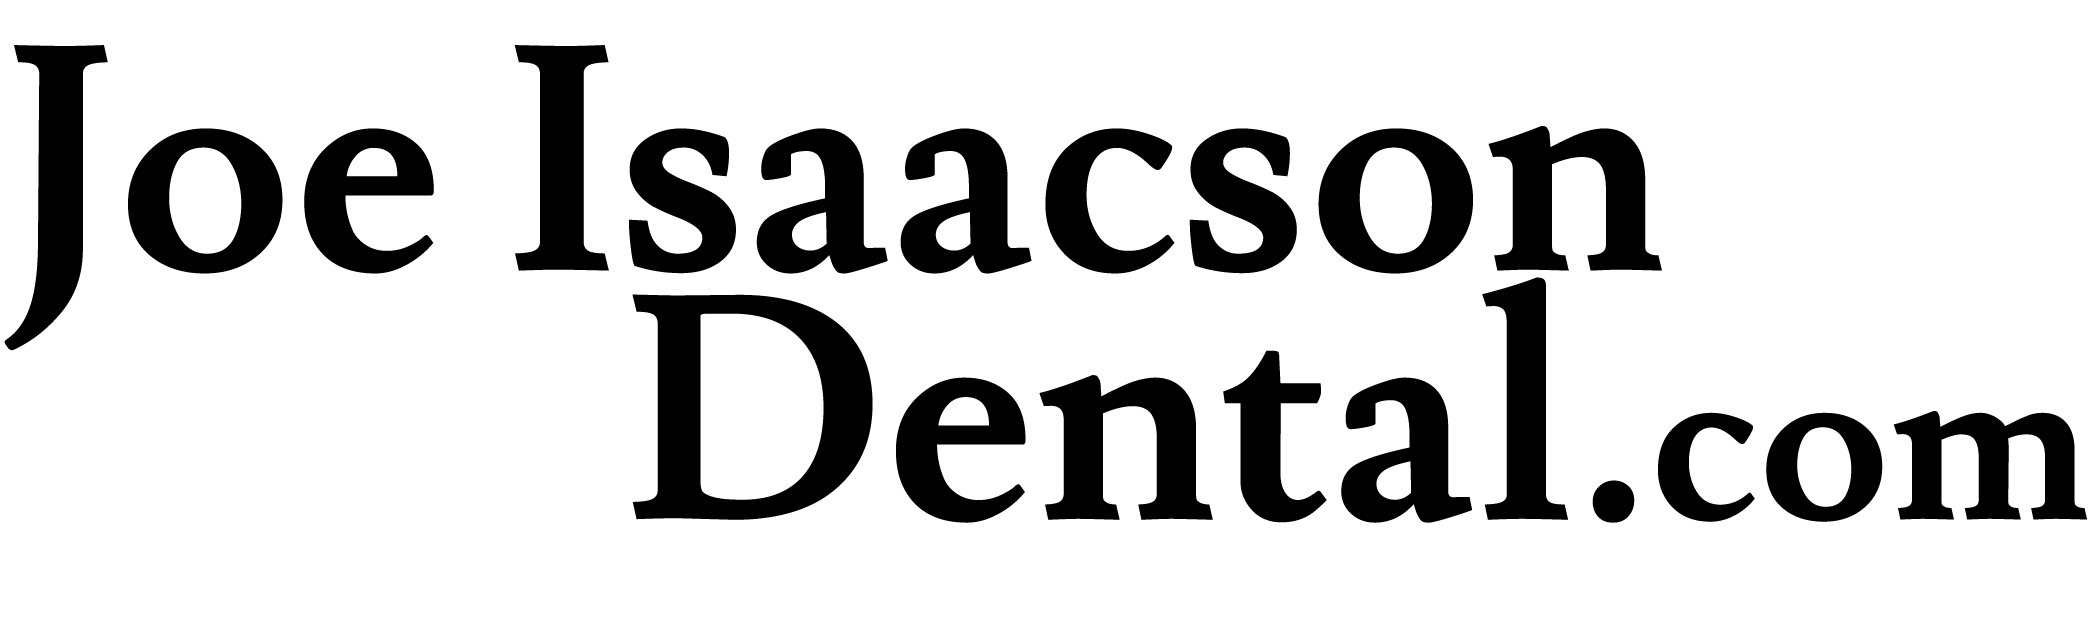 Joe Isaacson Dental